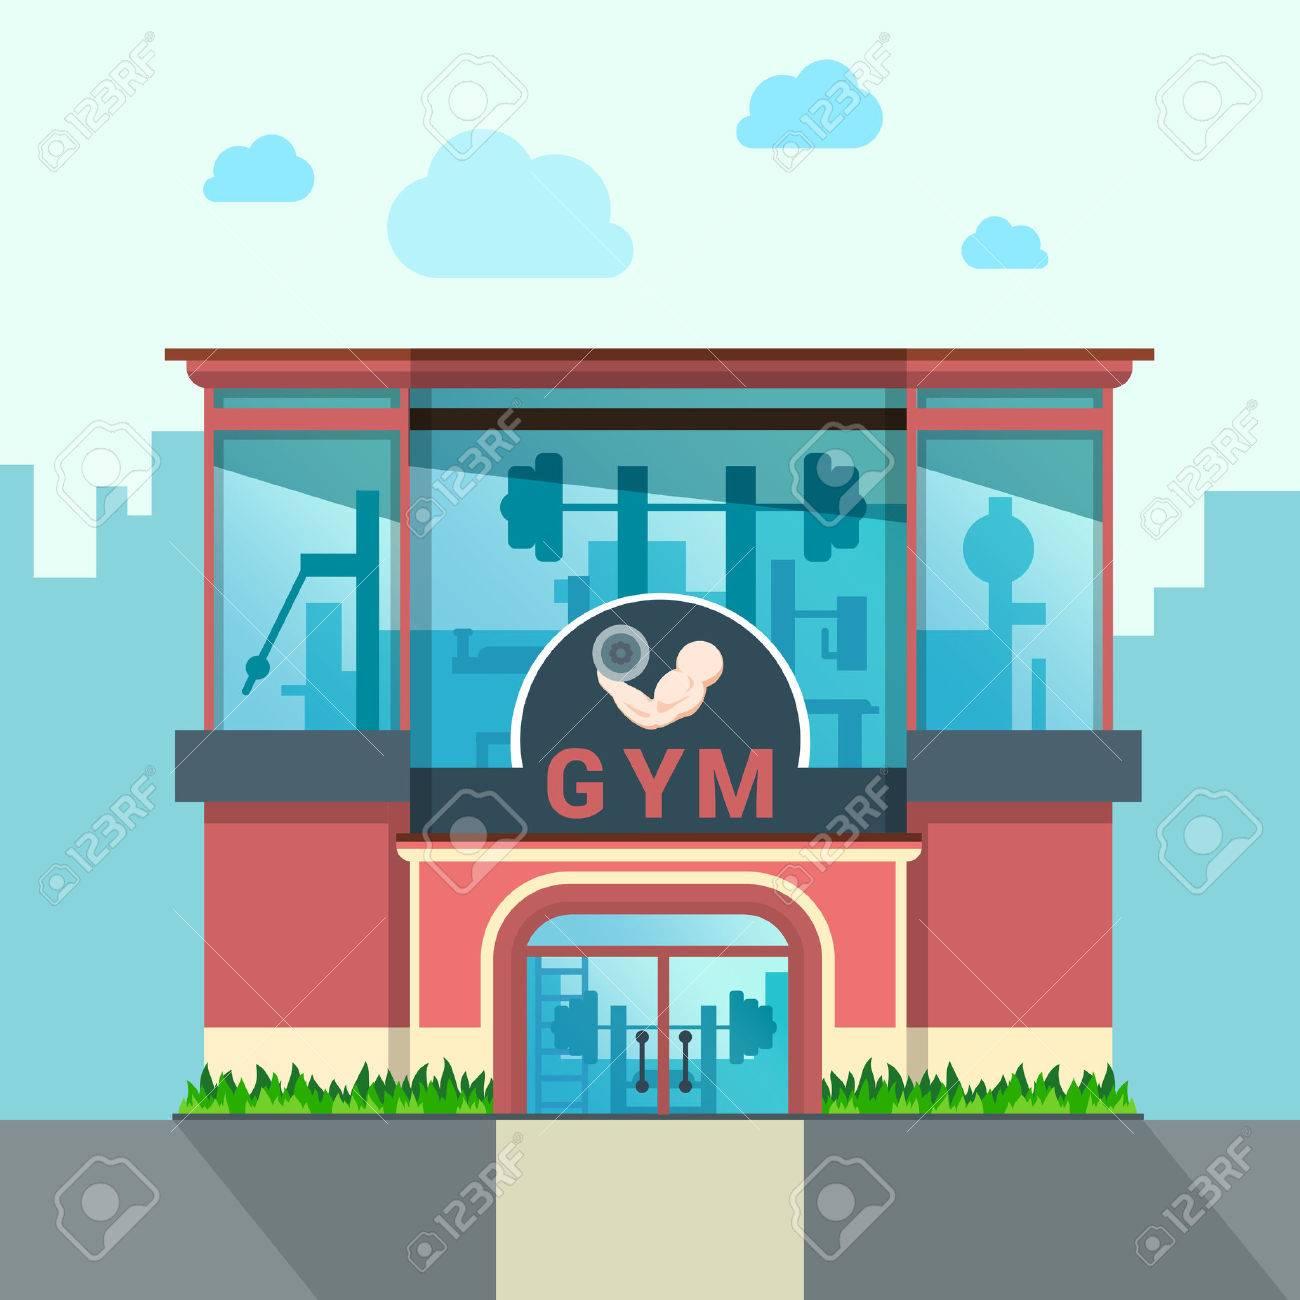 Gym building exterior outdoor front view facade showcase window concept. Flat style web site vector illustration. No people. Sports exercise conceptual. Stock Vector - 57398930